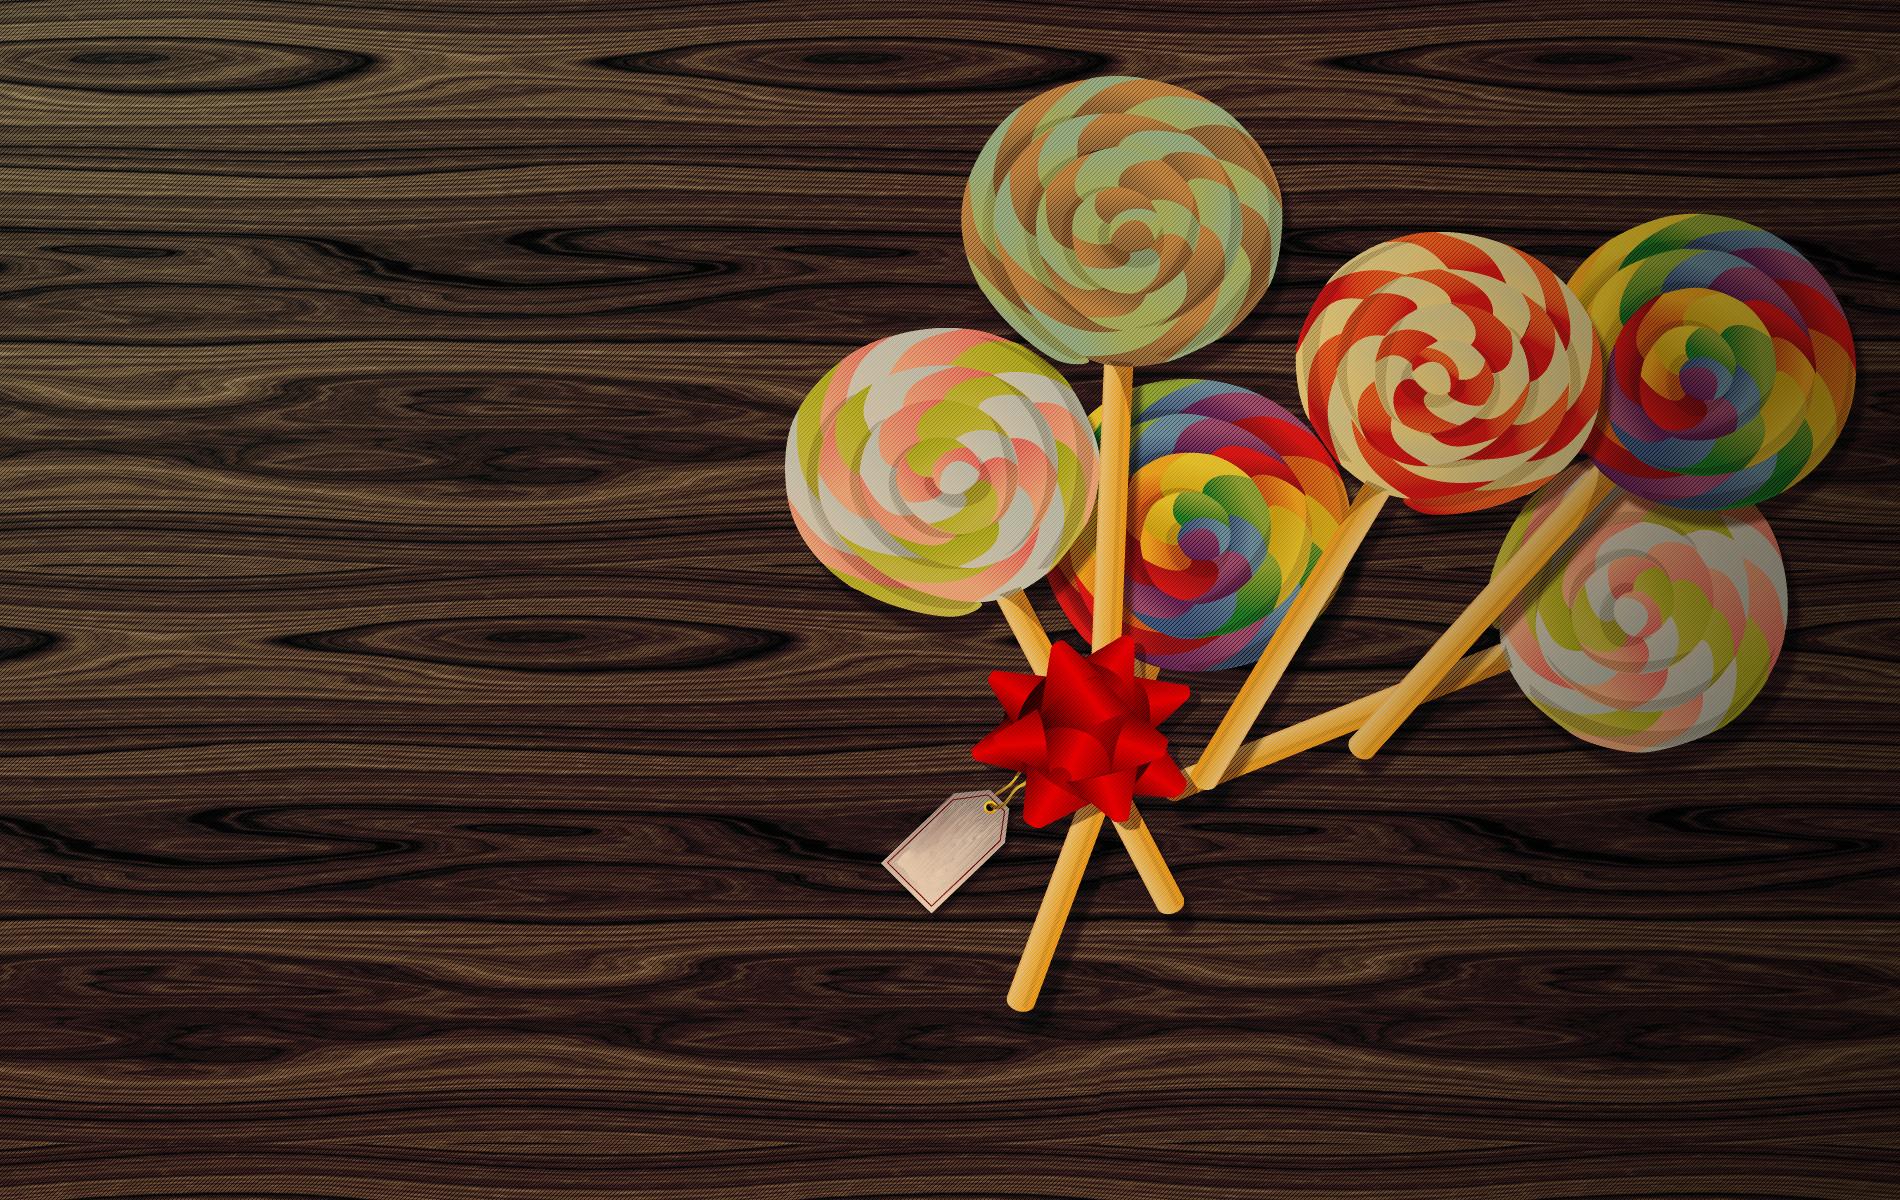 candy lollipop wallpapers pixelstalk android lollipop hd desktop wallpaper high definition 1900x1200